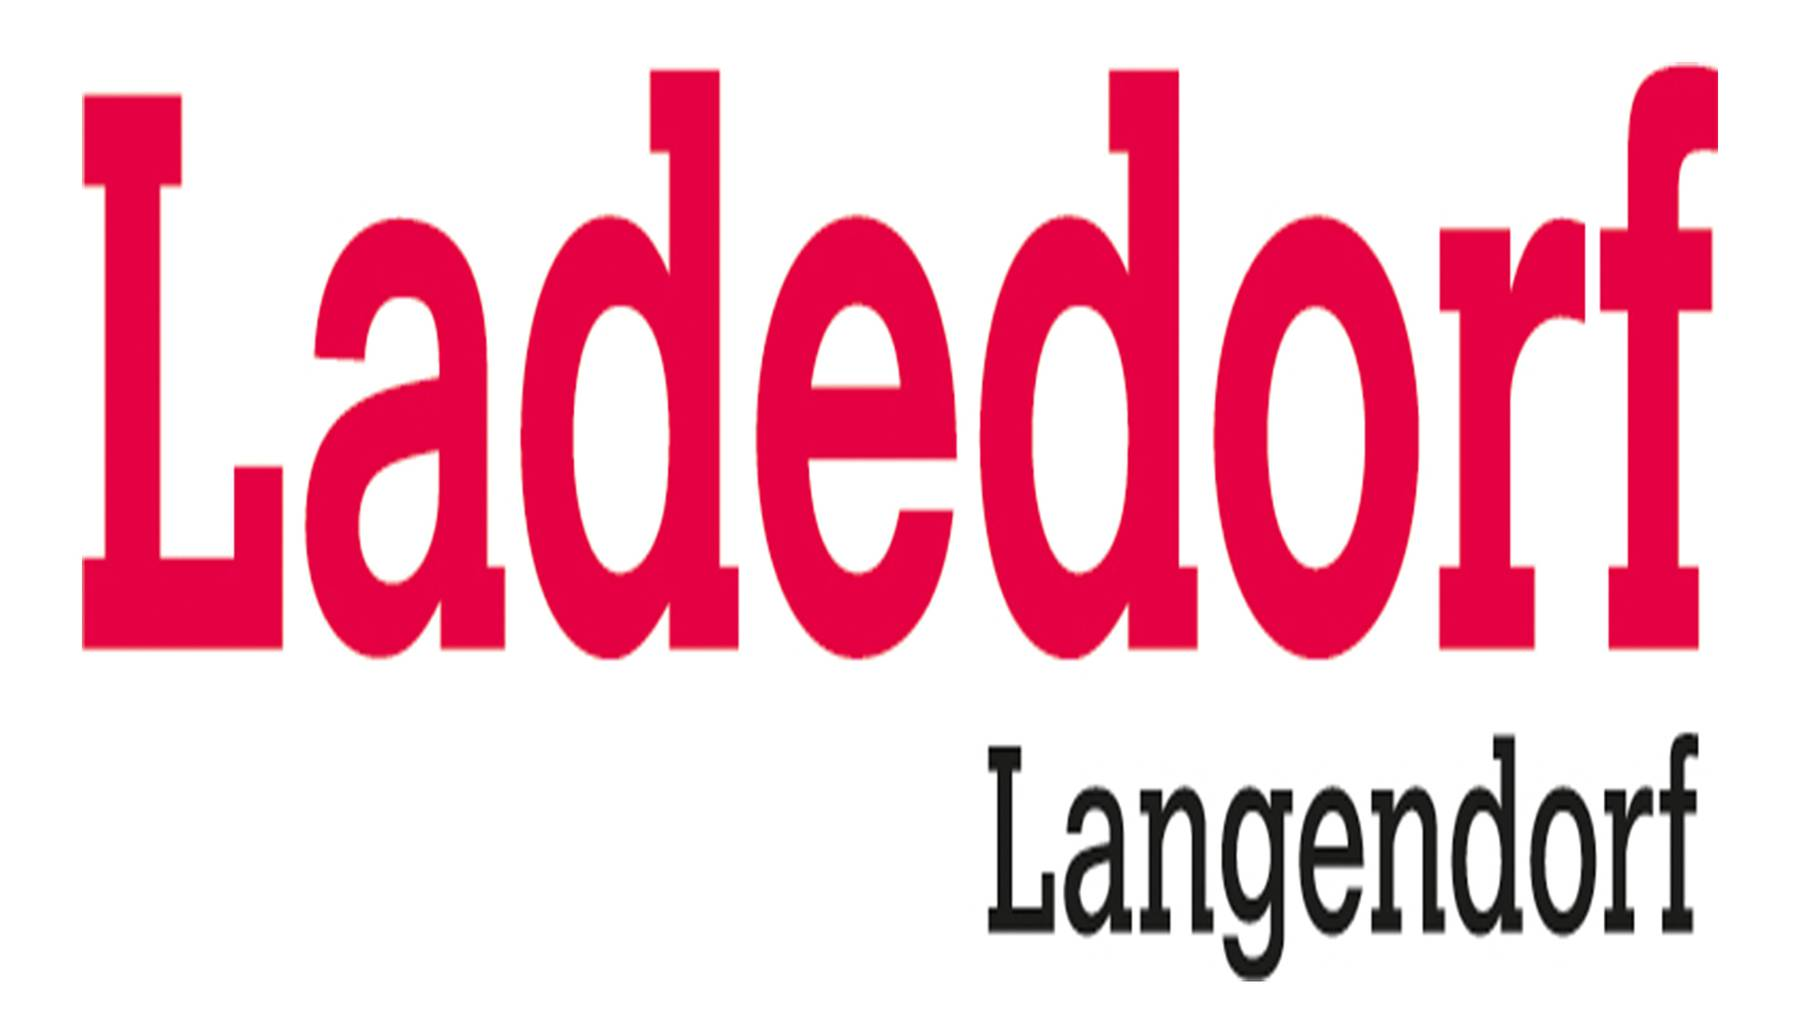 Ladedorf Pantone pos mit Langendorf